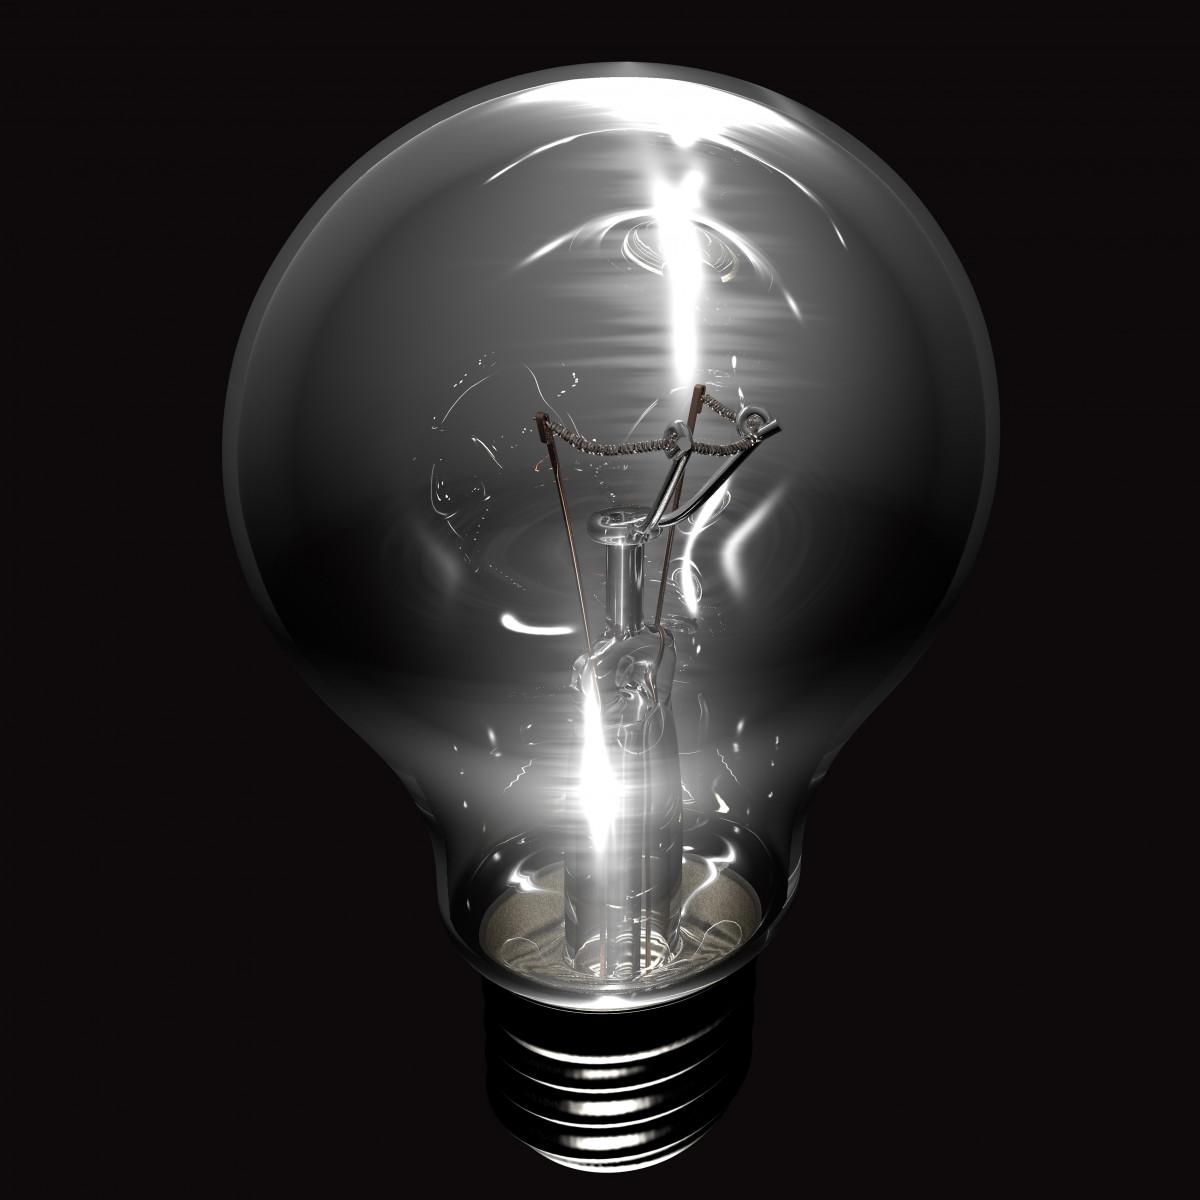 Free Images Macro Darkness Light Bulb Lighting Filament Energy Current Elektrik Glow